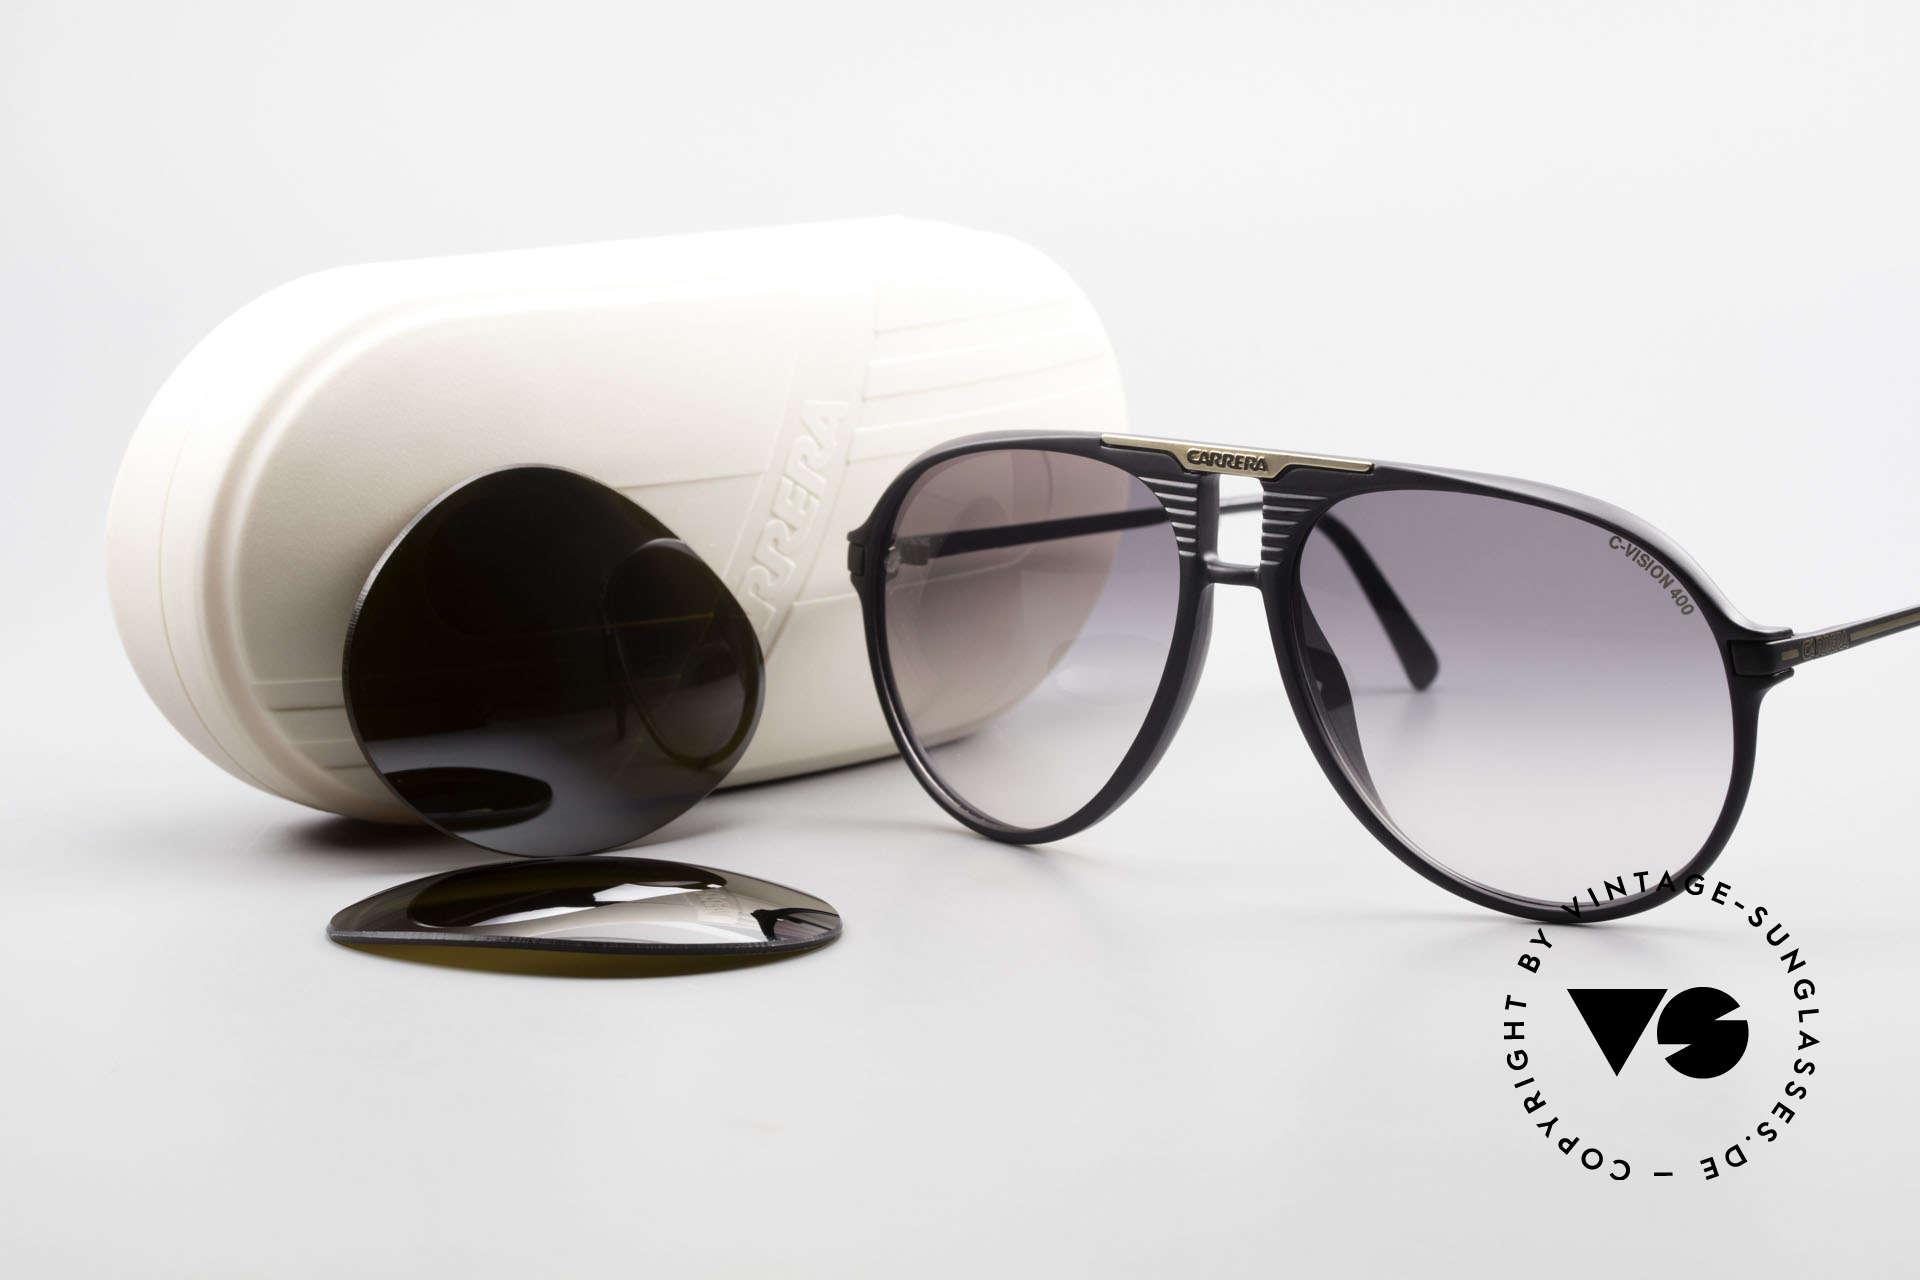 Carrera 5595 80's Shades Extra Sun Lenses, NO RETRO sunglasses, but a 35 years old original, Made for Men